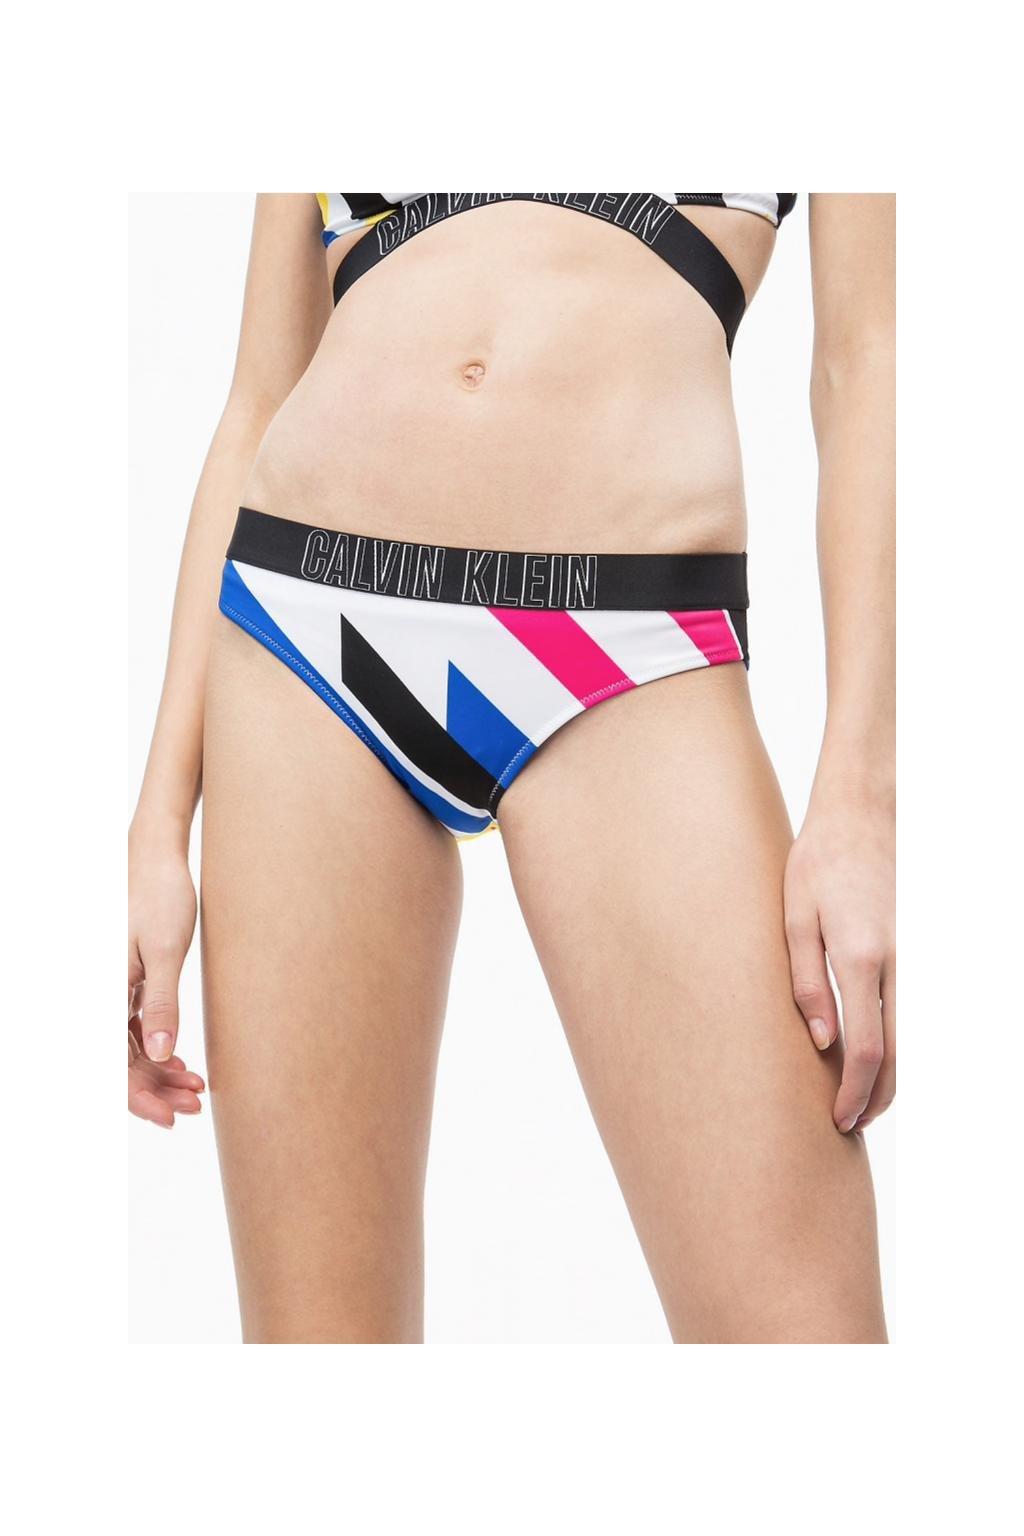 CK classic bikini Intense Power plavky - Stripe